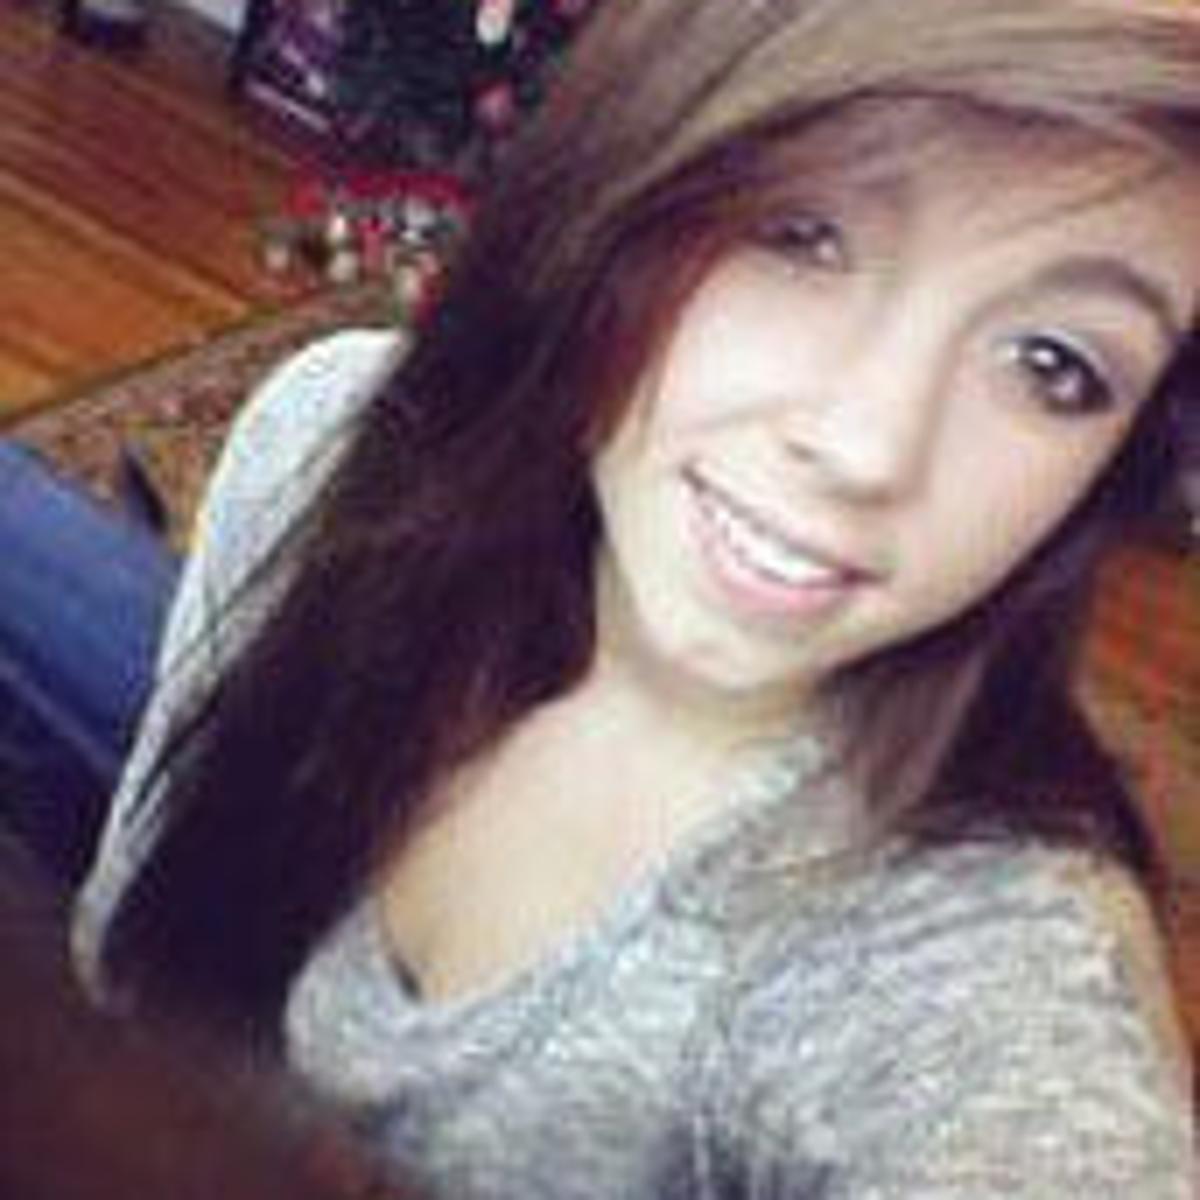 Public's help still sought to find three missing Idaho